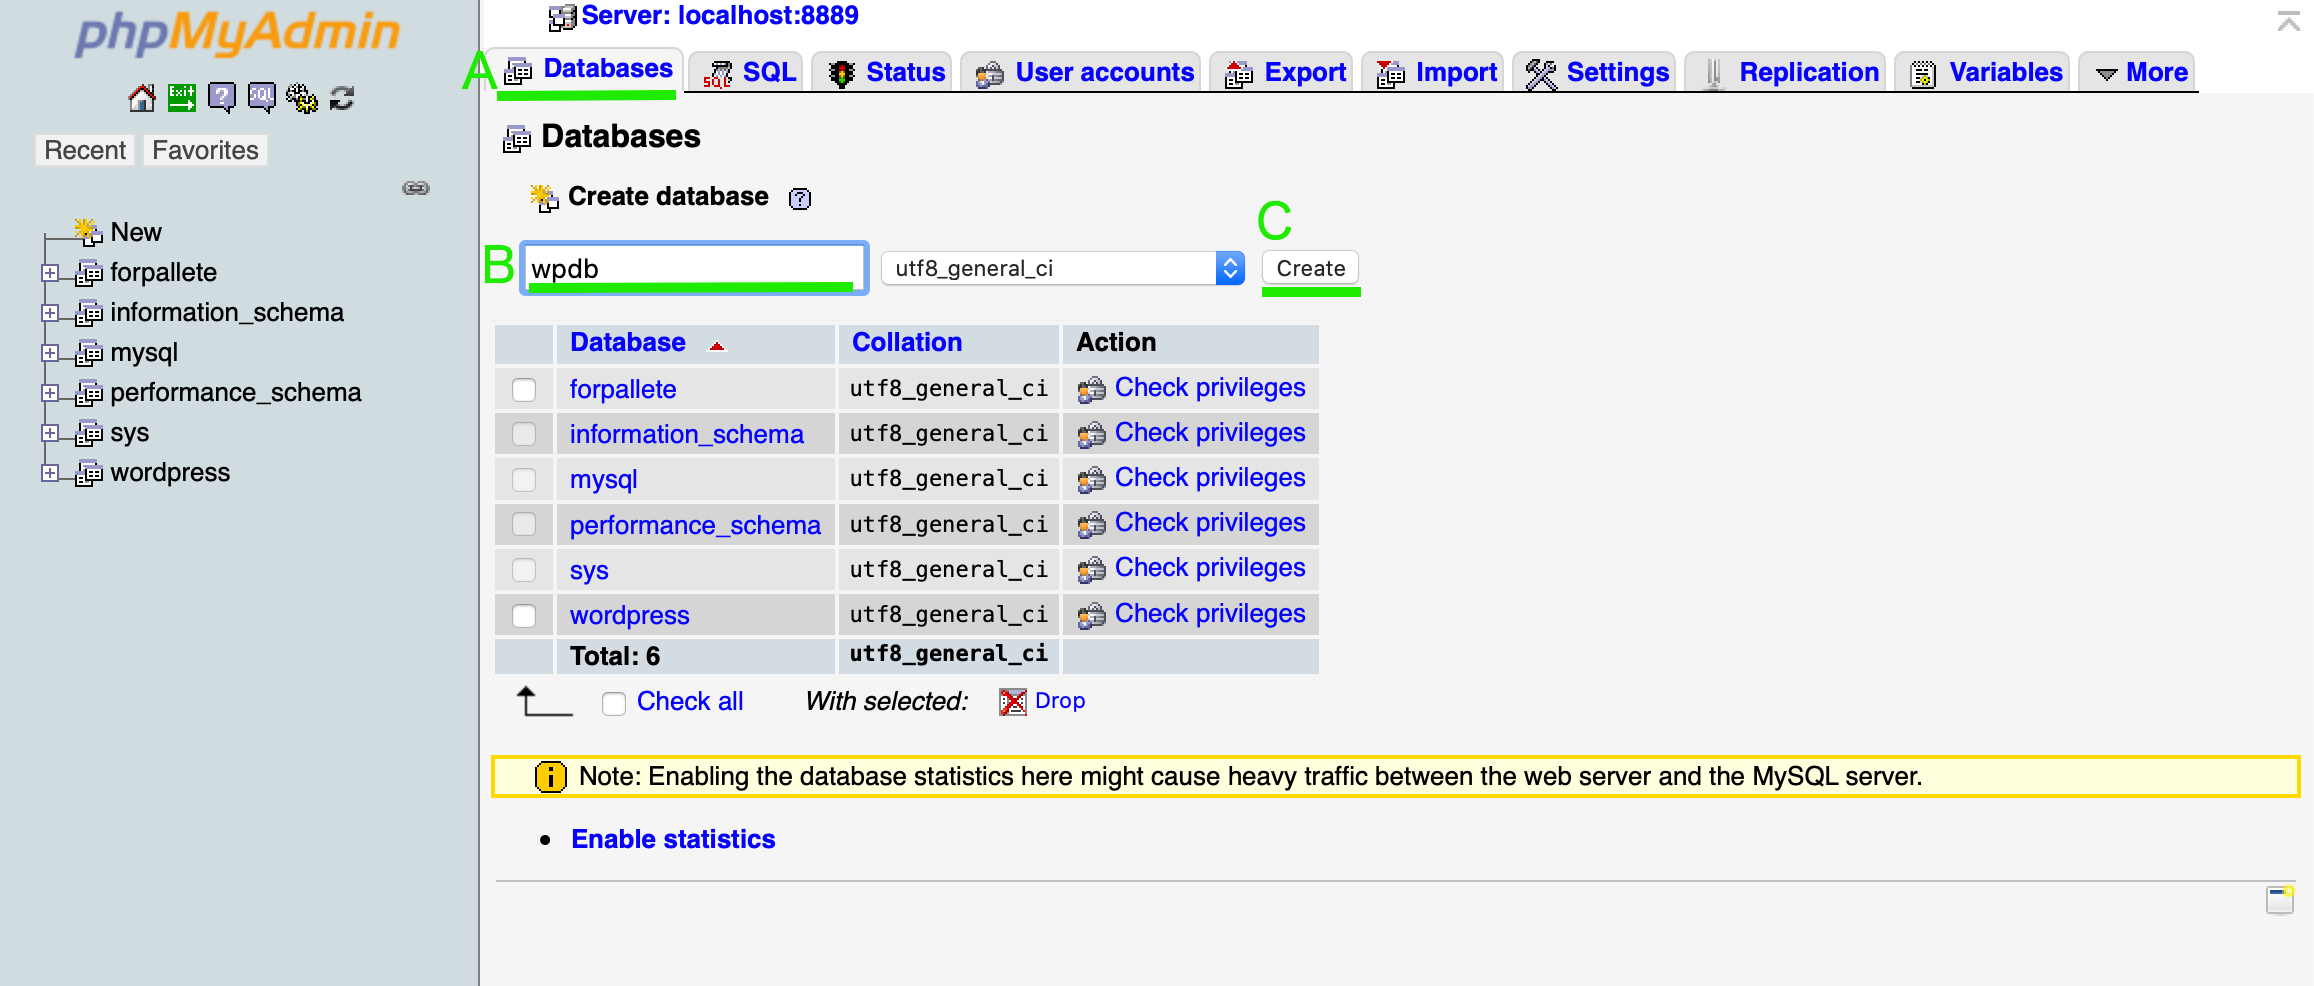 phpMyAdminでデータベースを作成